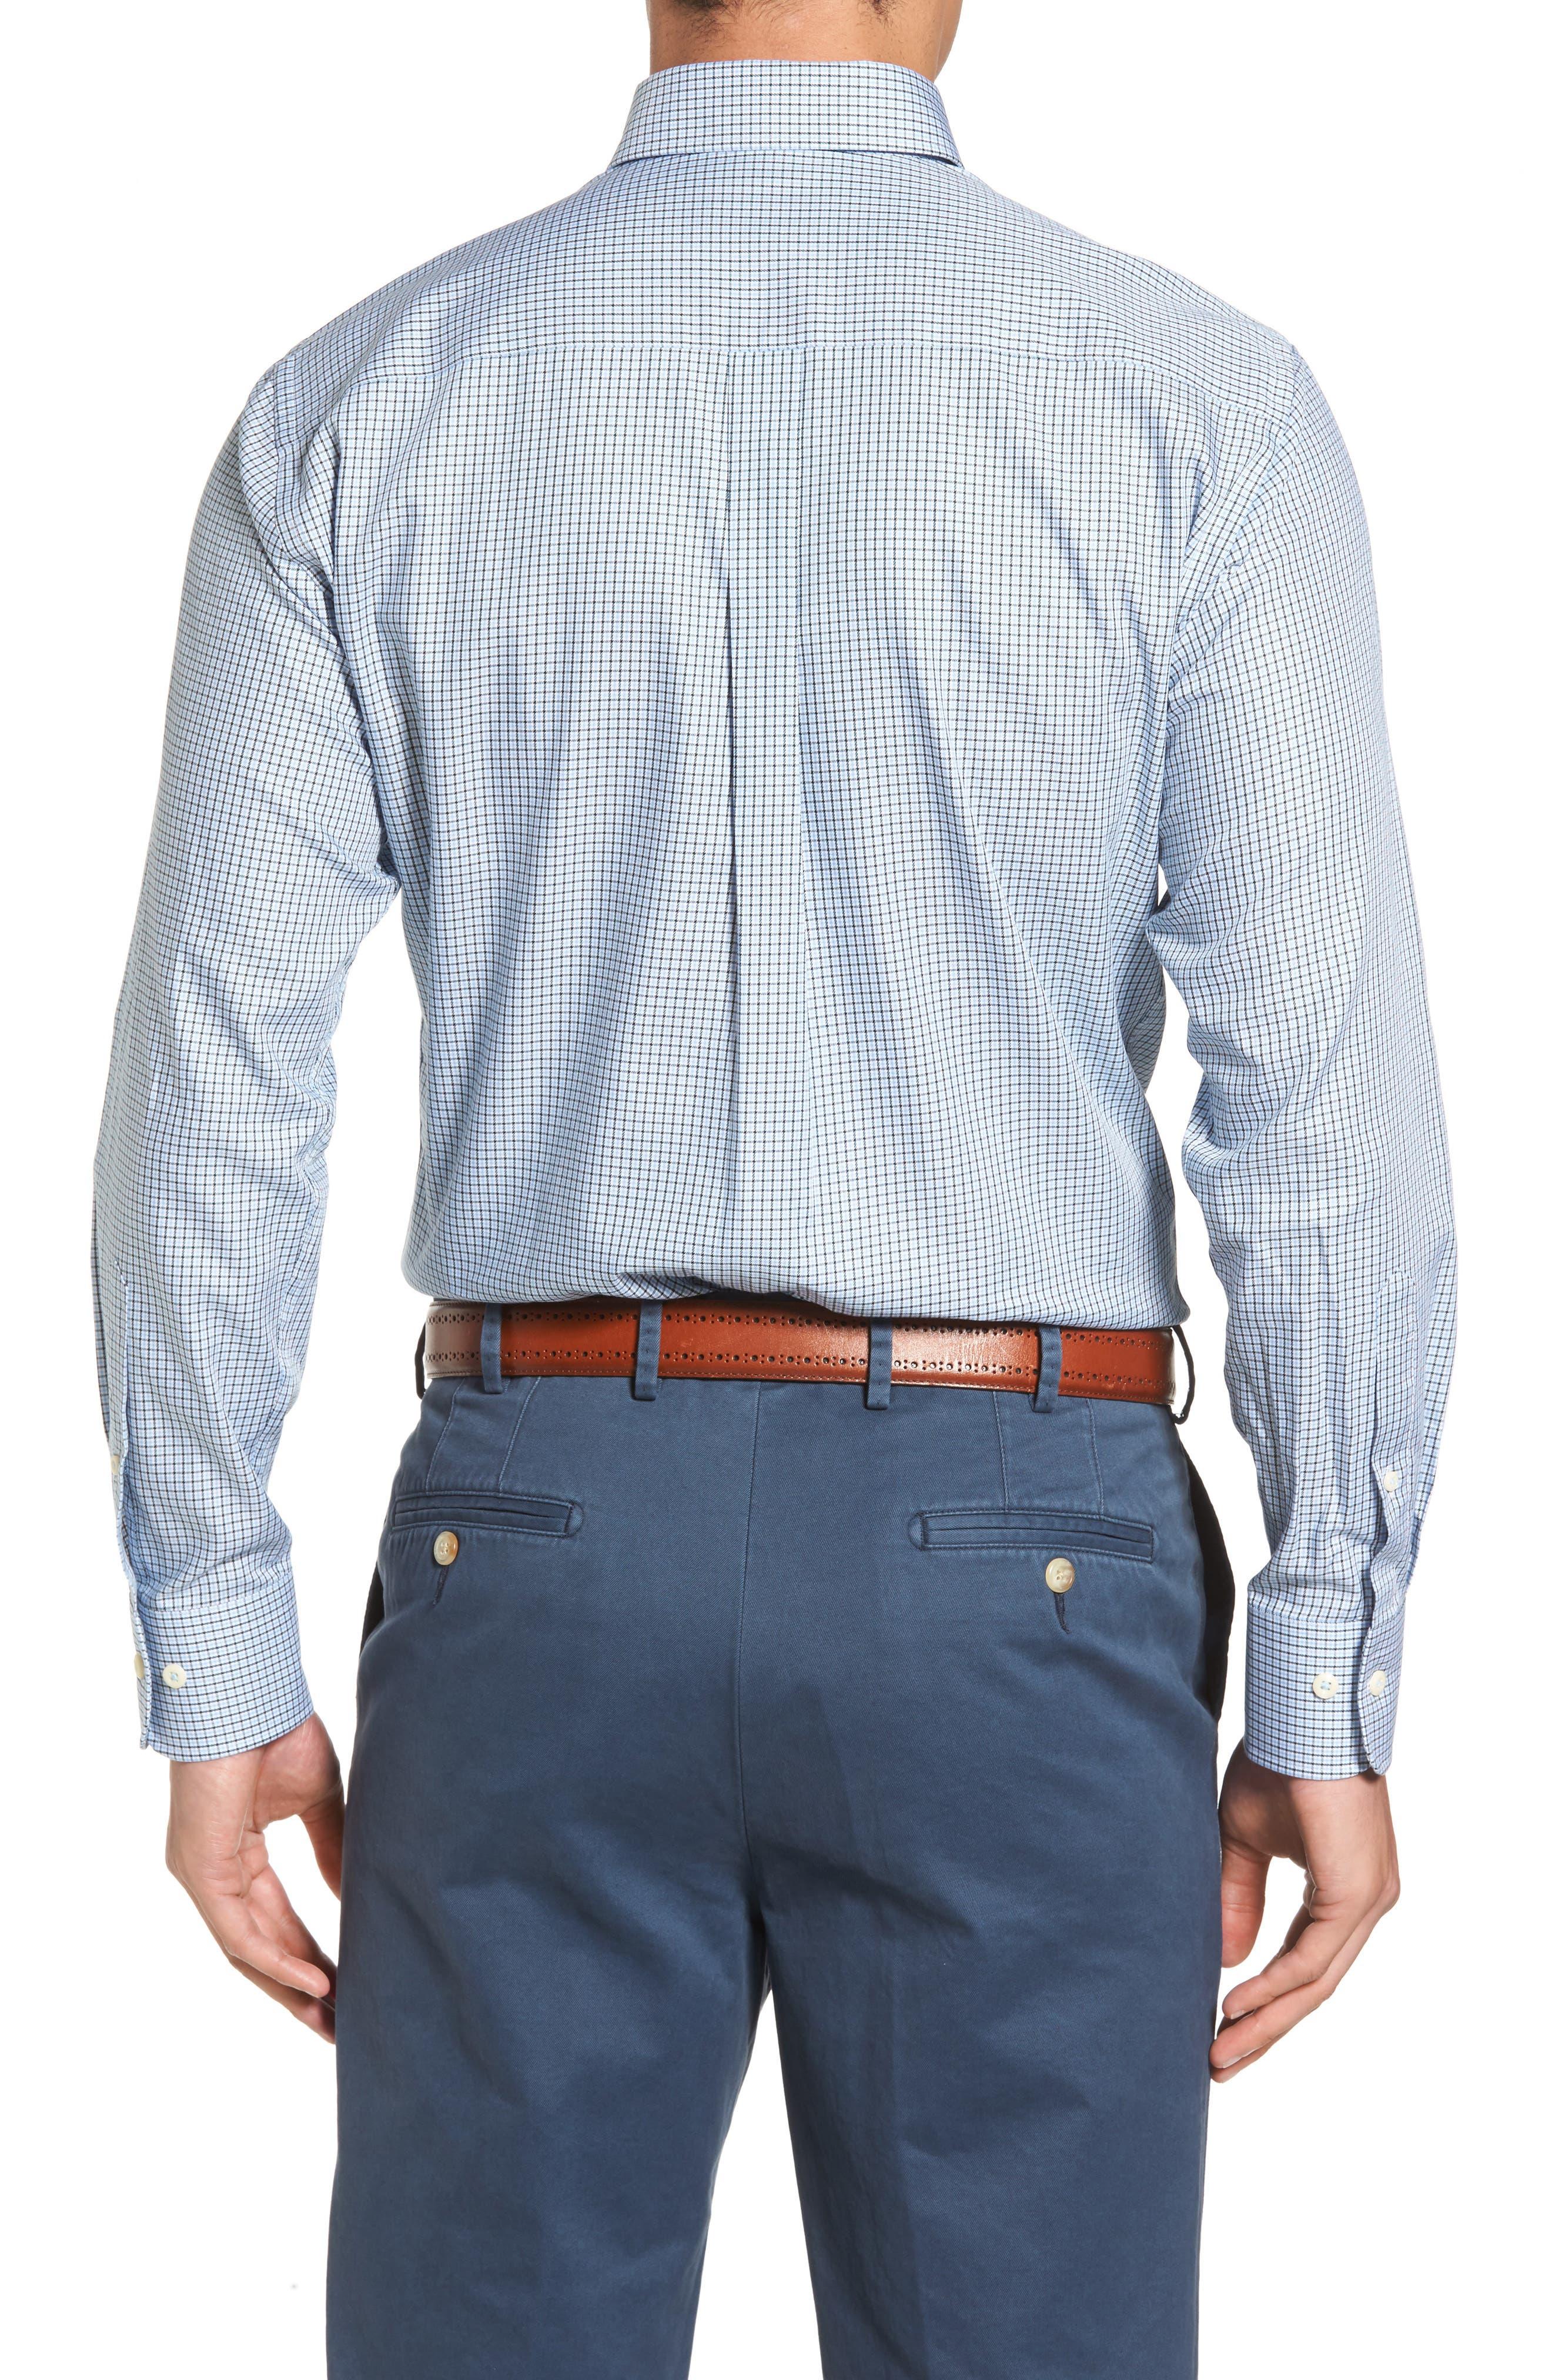 Elevation Regular Fit Check Sport Shirt,                             Alternate thumbnail 2, color,                             439